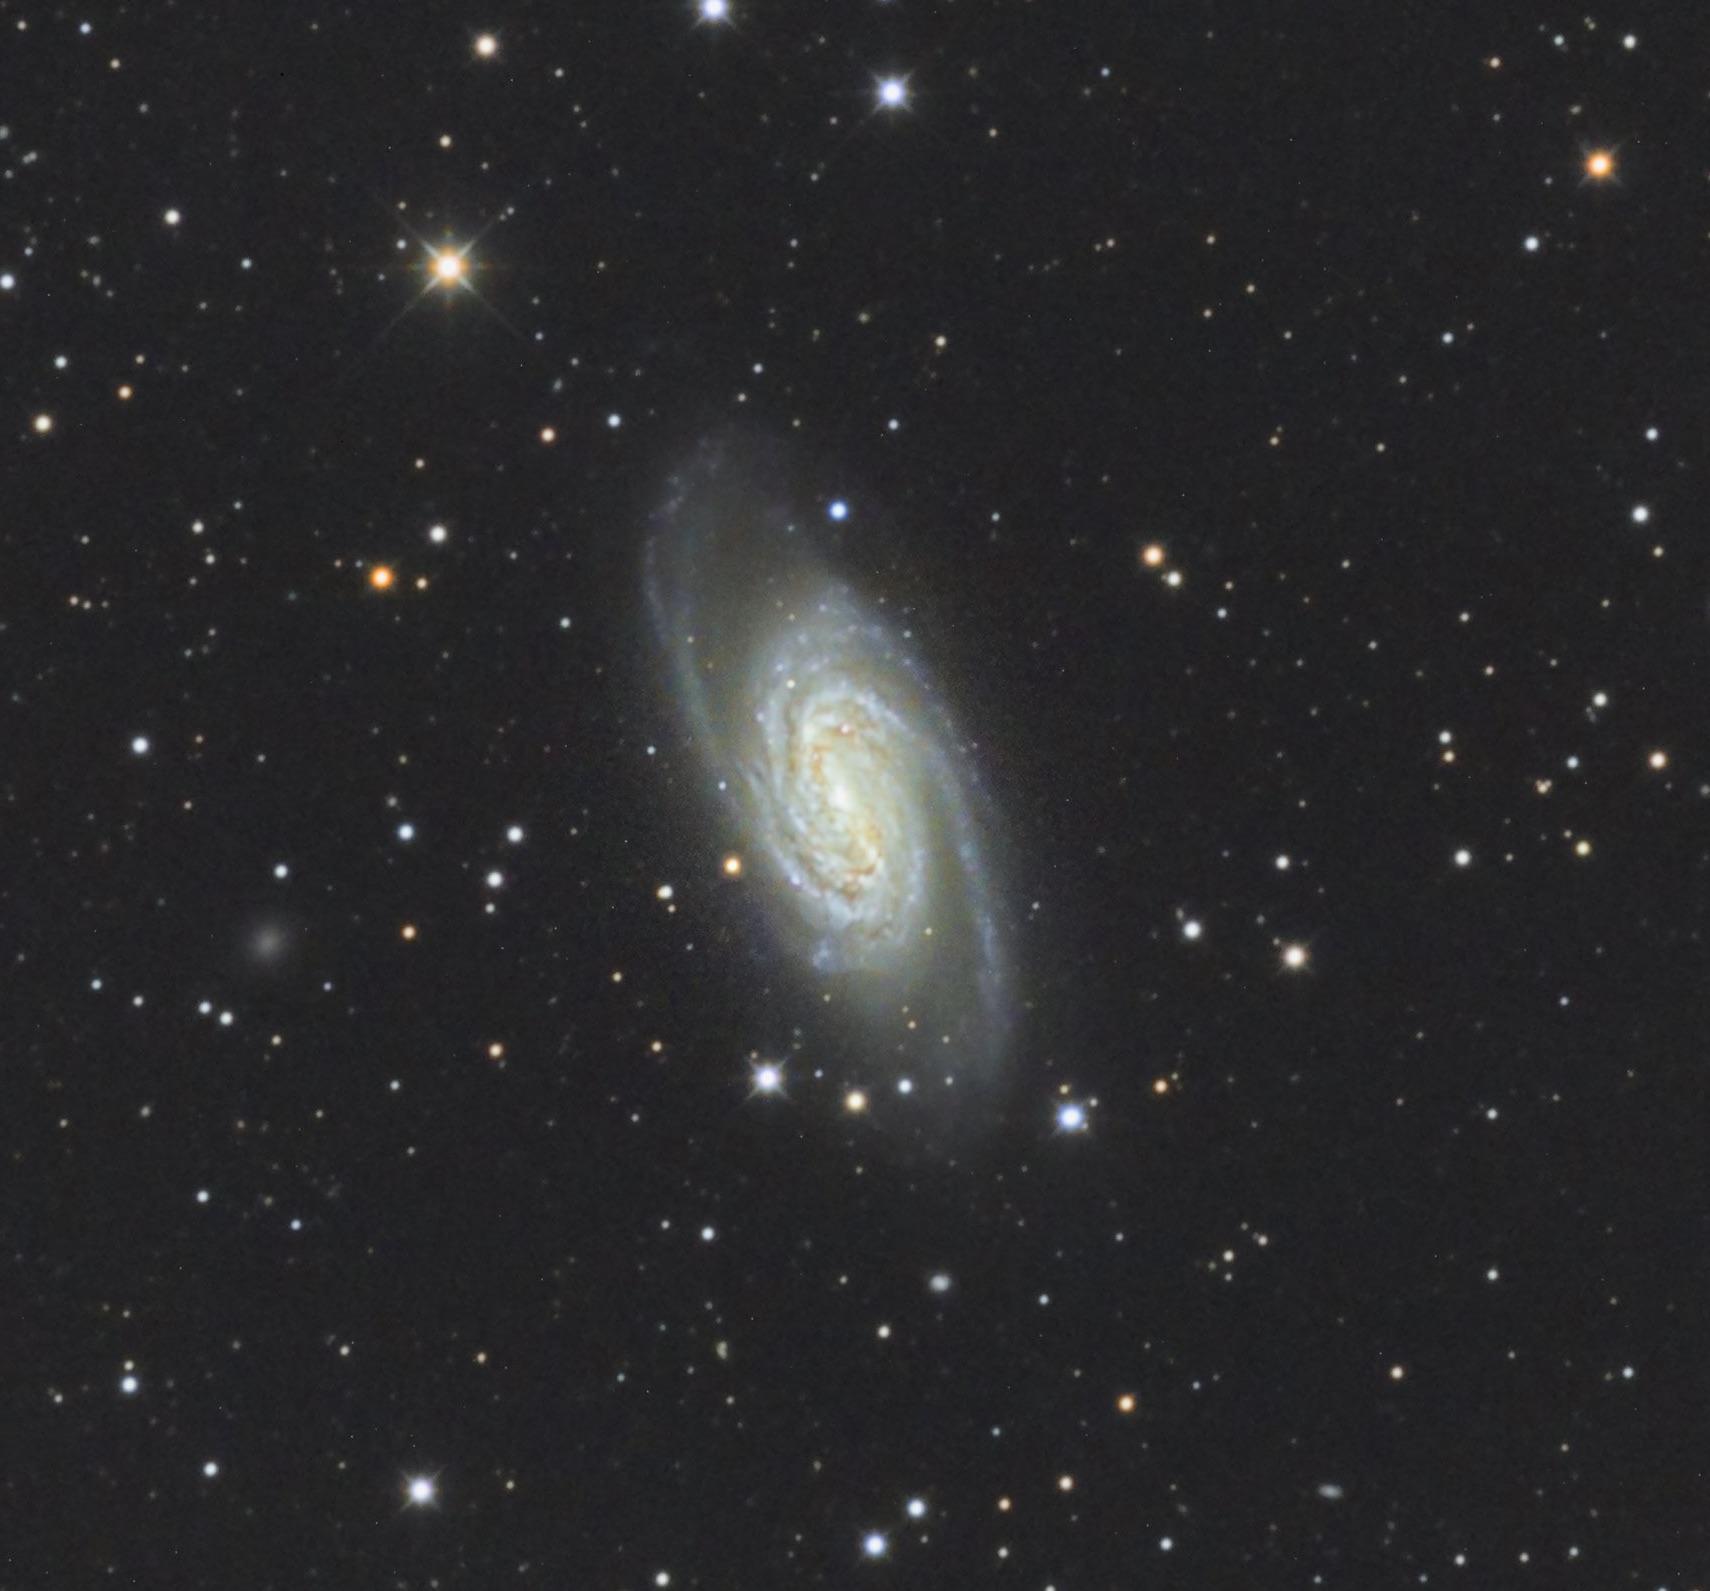 f:id:snct-astro:20210313100628j:plain